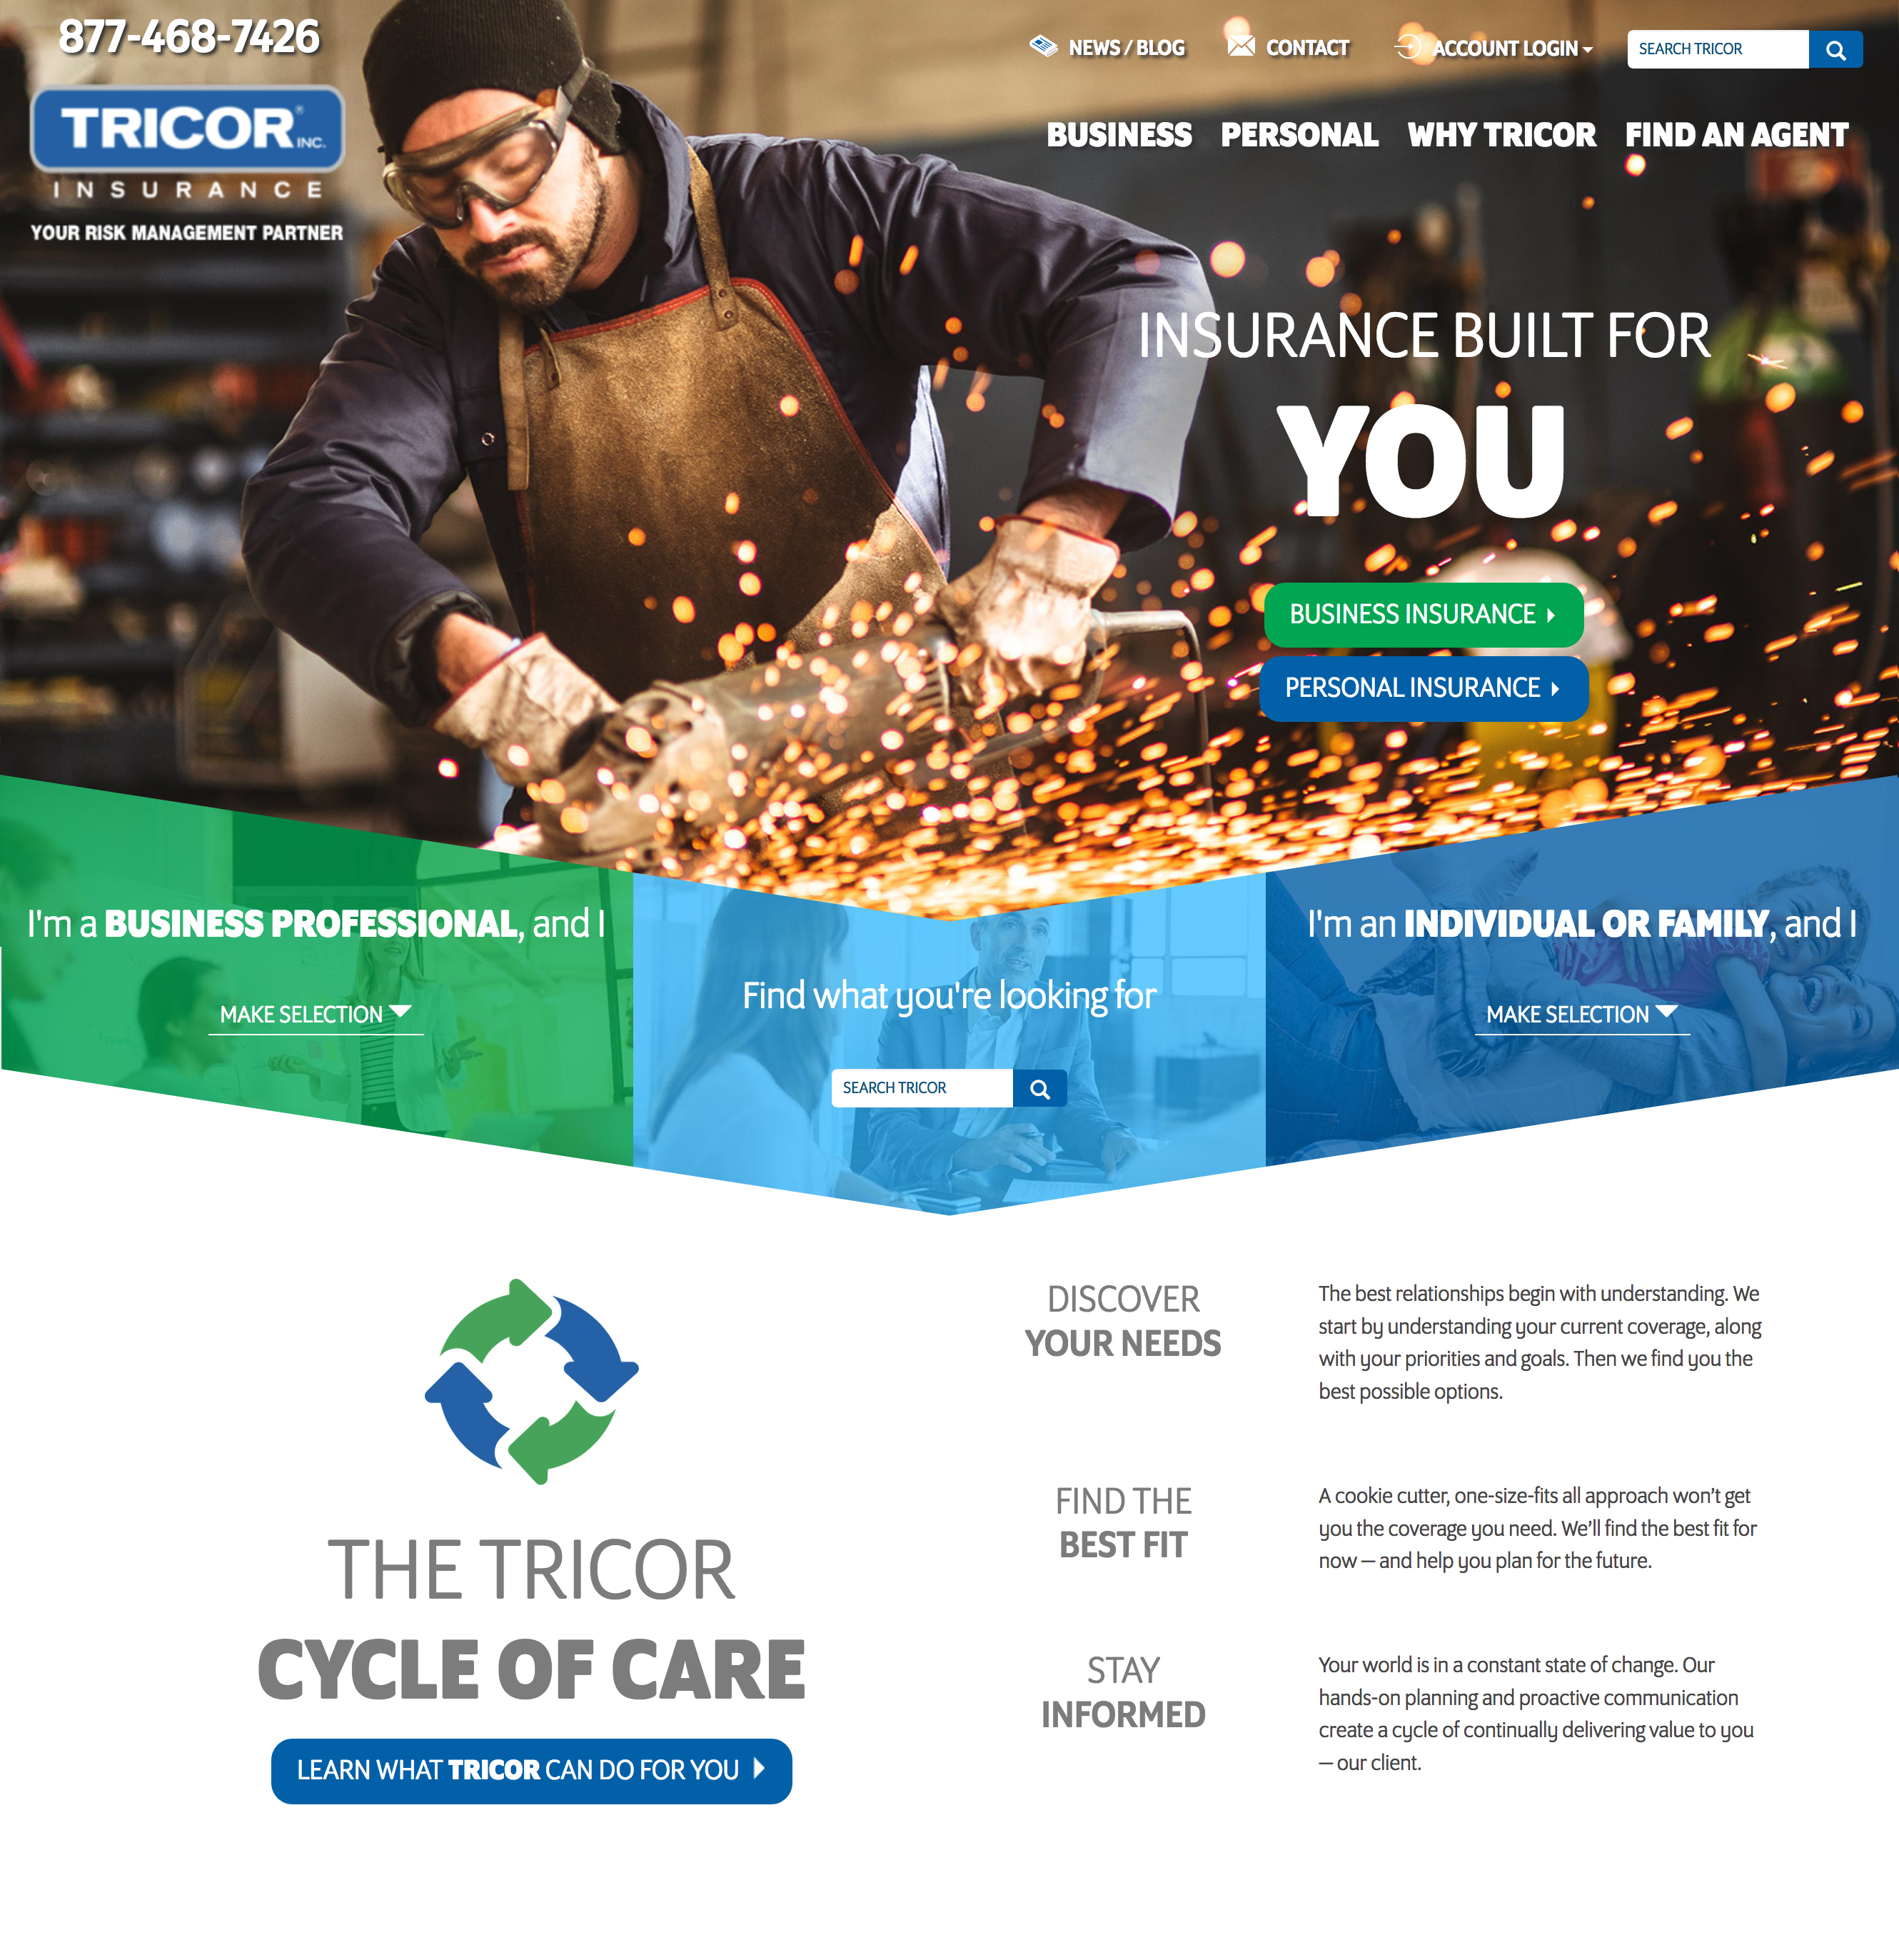 TRICOR Insurance image